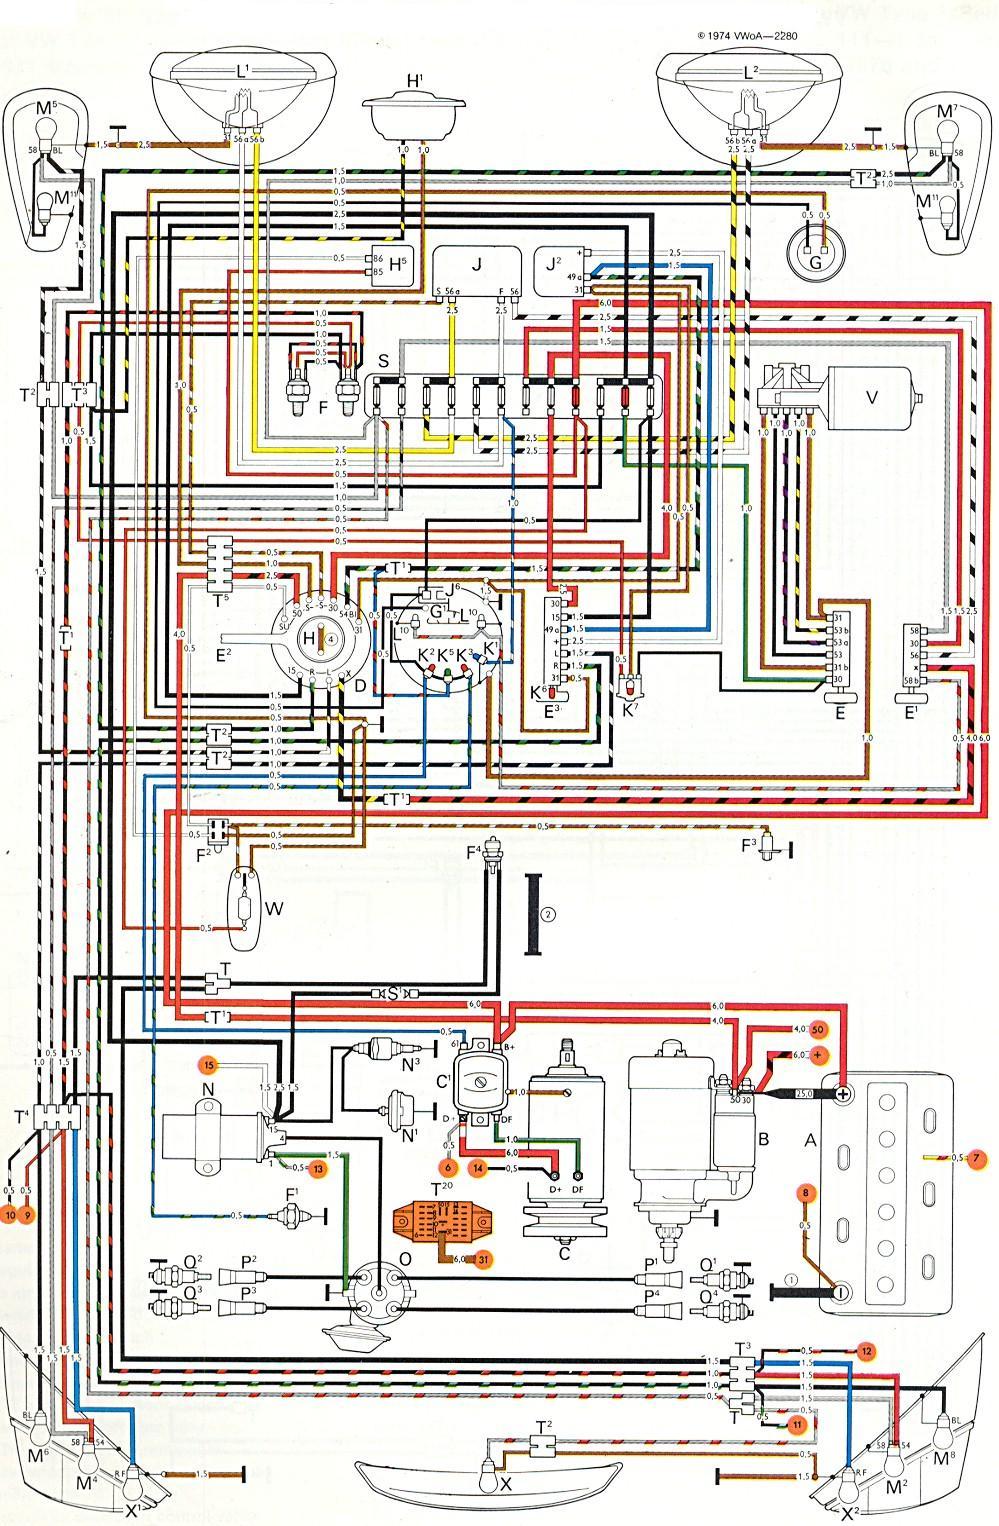 spark plug wiring diagram vw bus 19 12 combatarms game de \u2022 1968 volkswagen wiring diagram wiring schematic diagram rh 58 twizer co 77 vw van wiring diagram